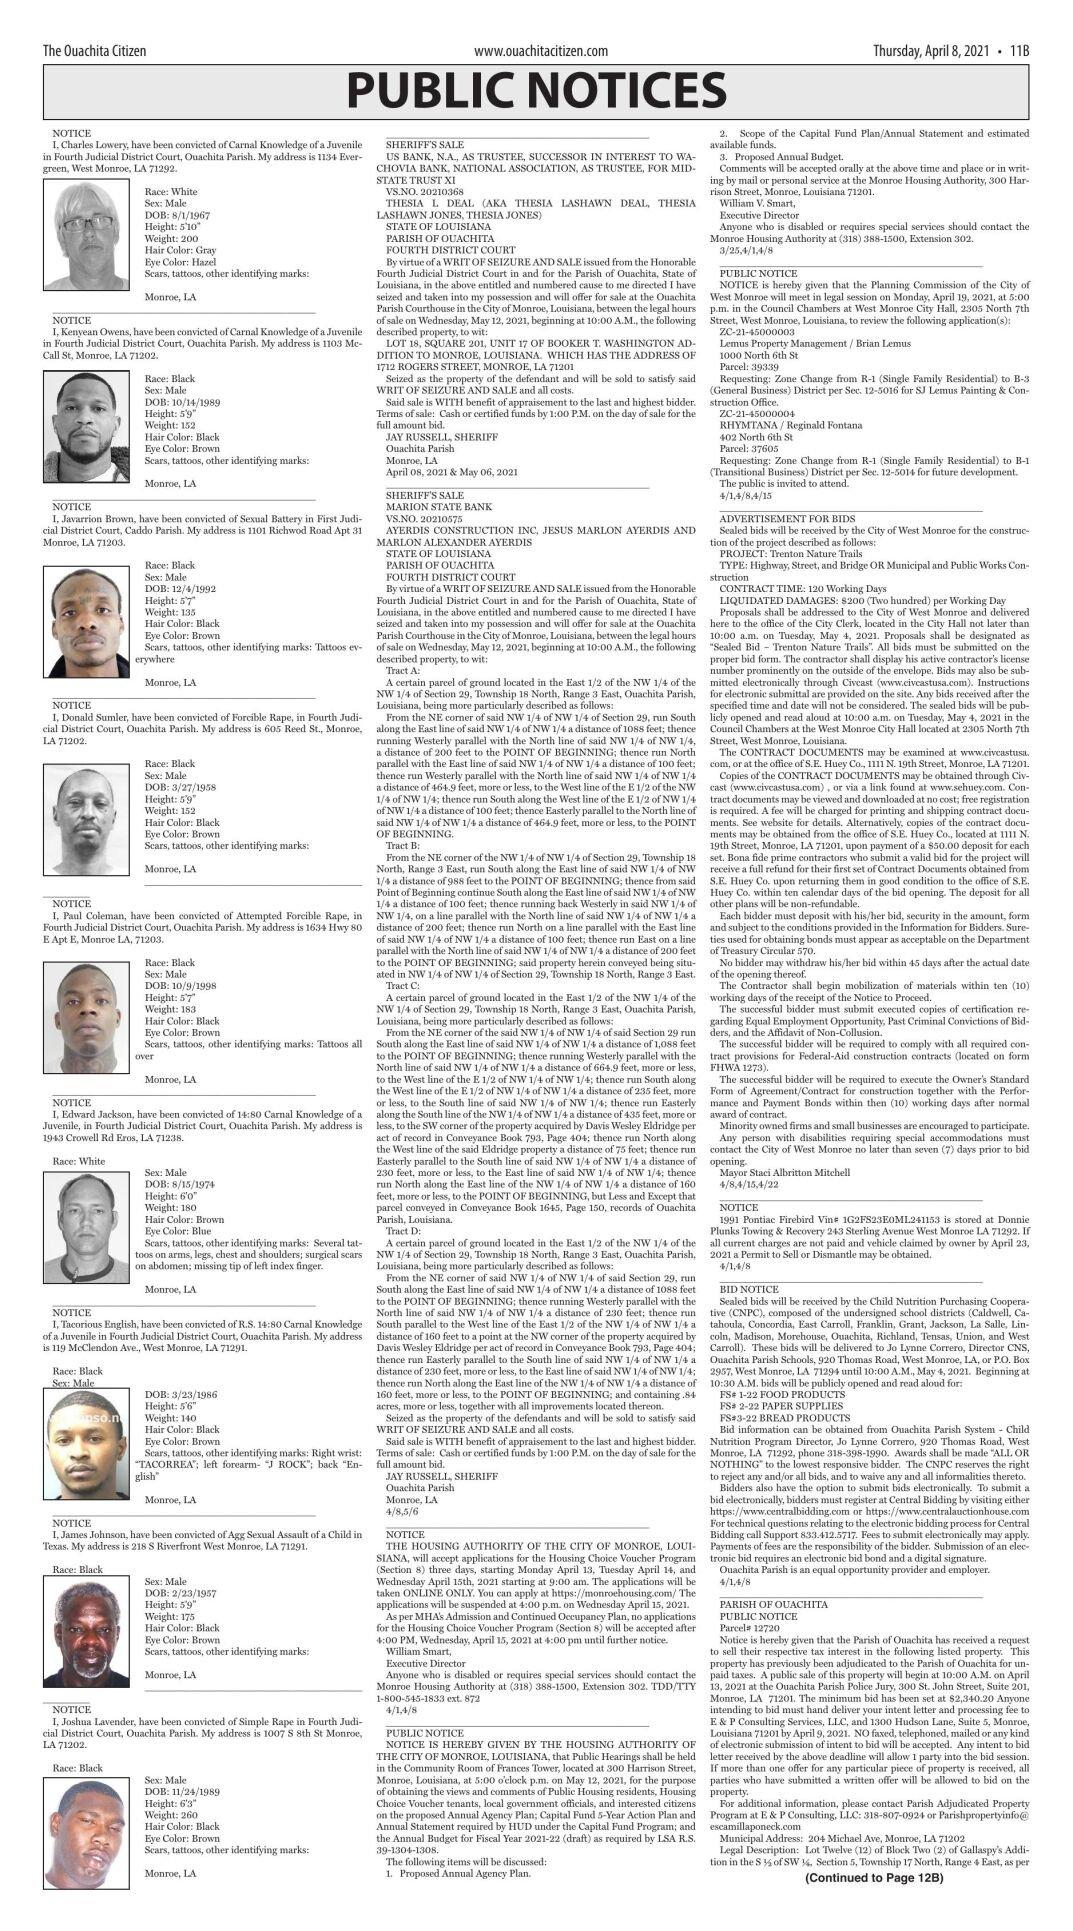 April 8, 2021 Public notices, click to download pages